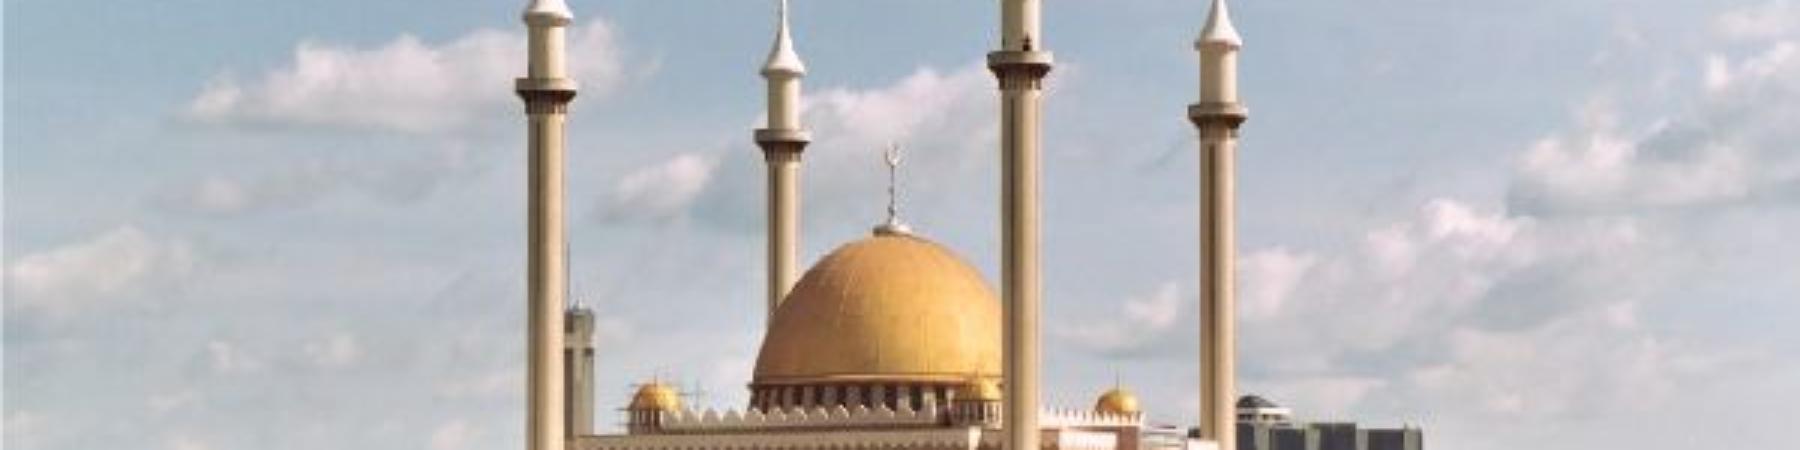 Mosque @ FCT Abuja, Nigeria